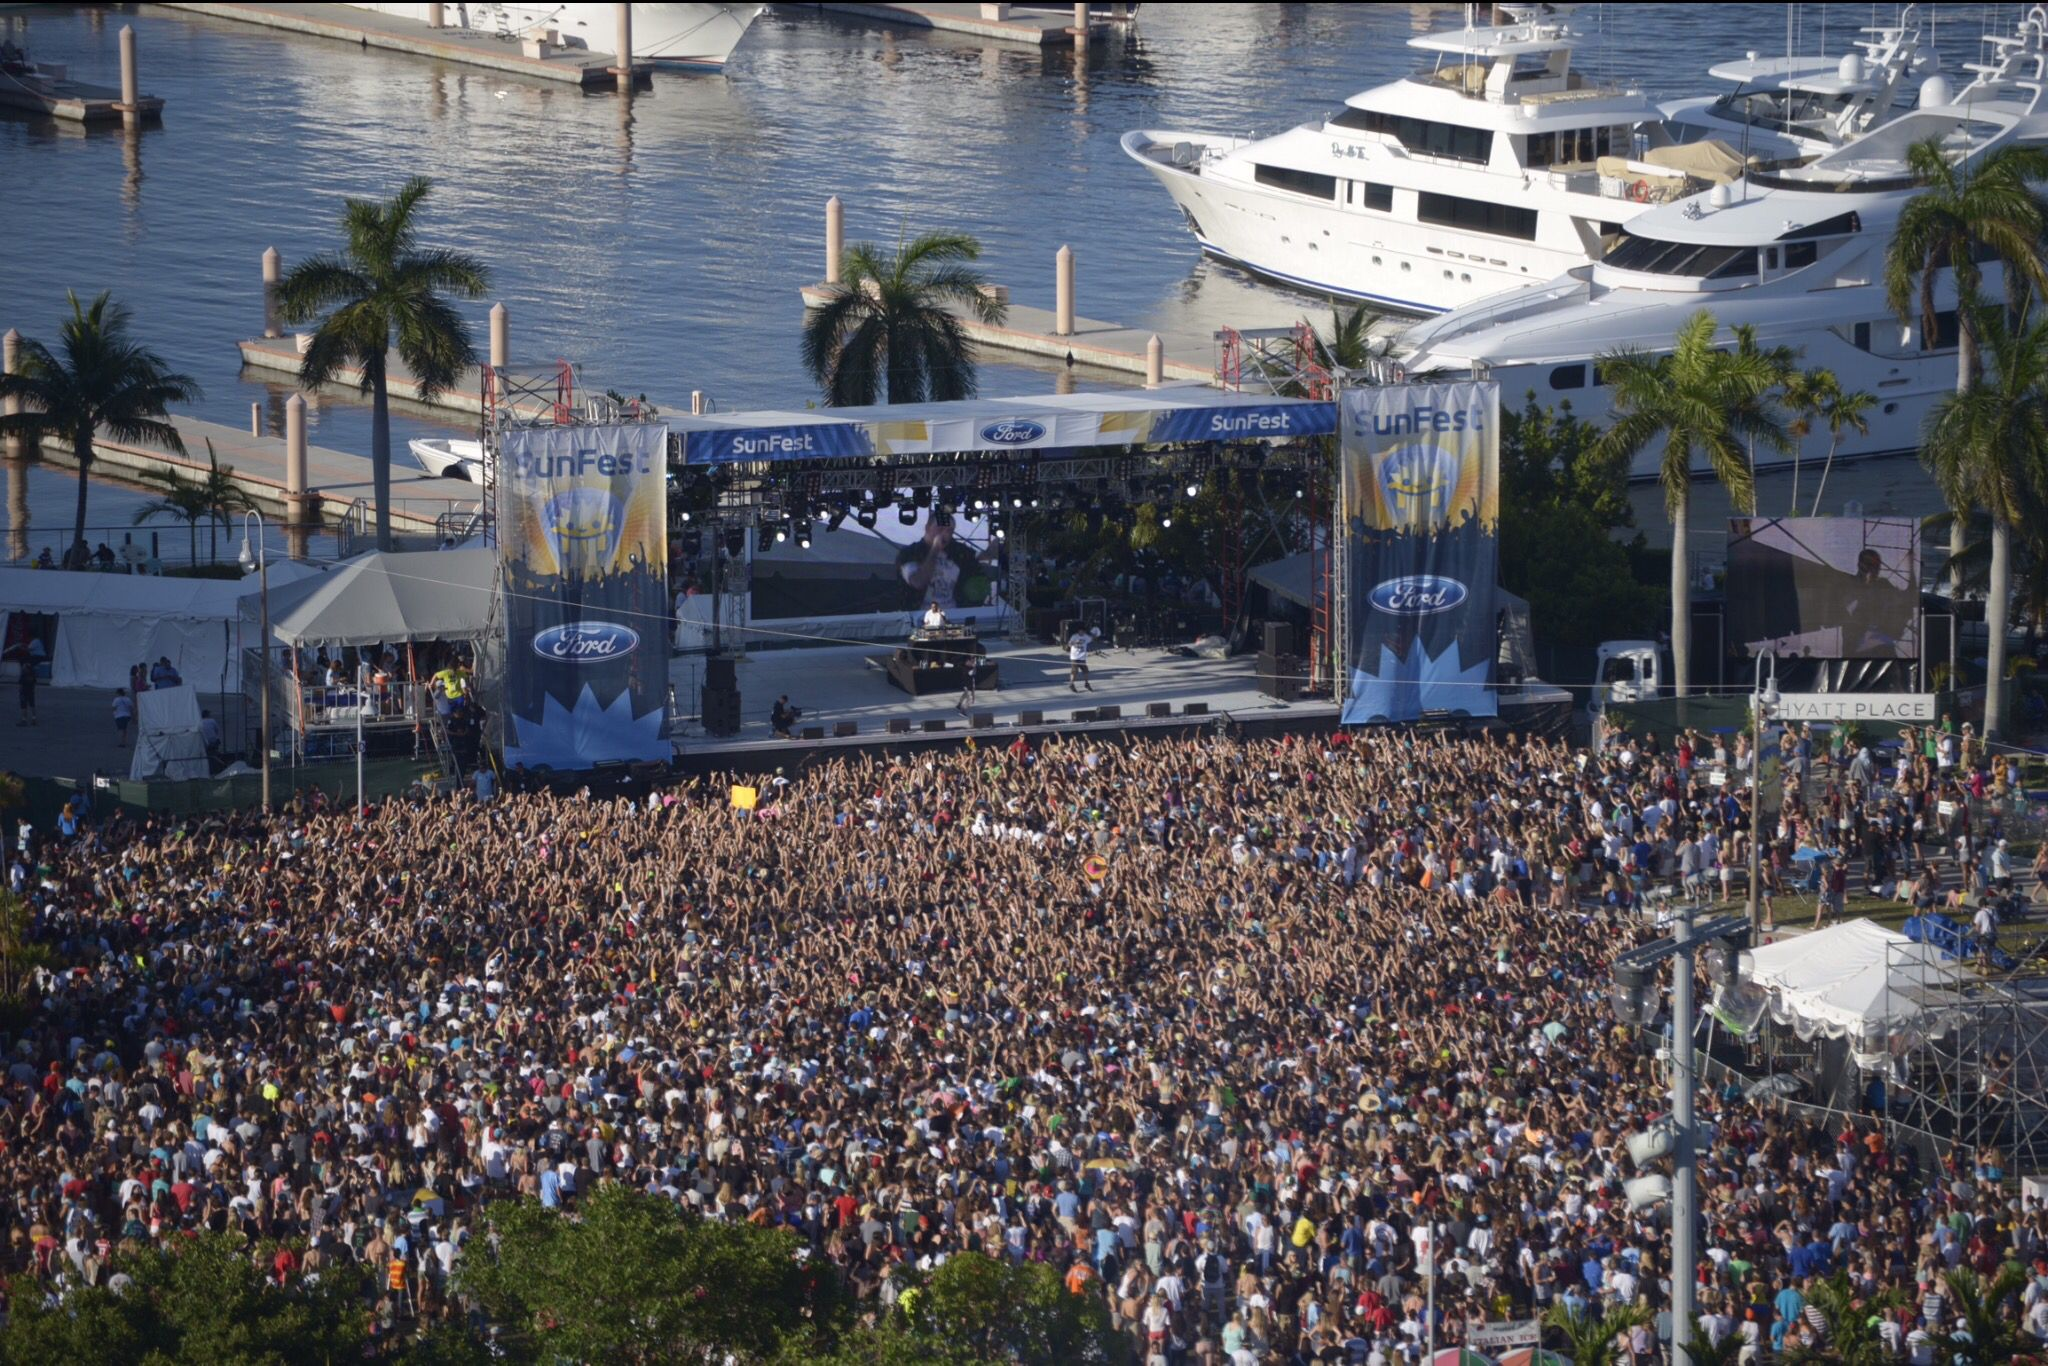 Sunfest Music Festival At The West Palm Beach Waterfront Downtown West Palm Beach Palm Beach Beach Books